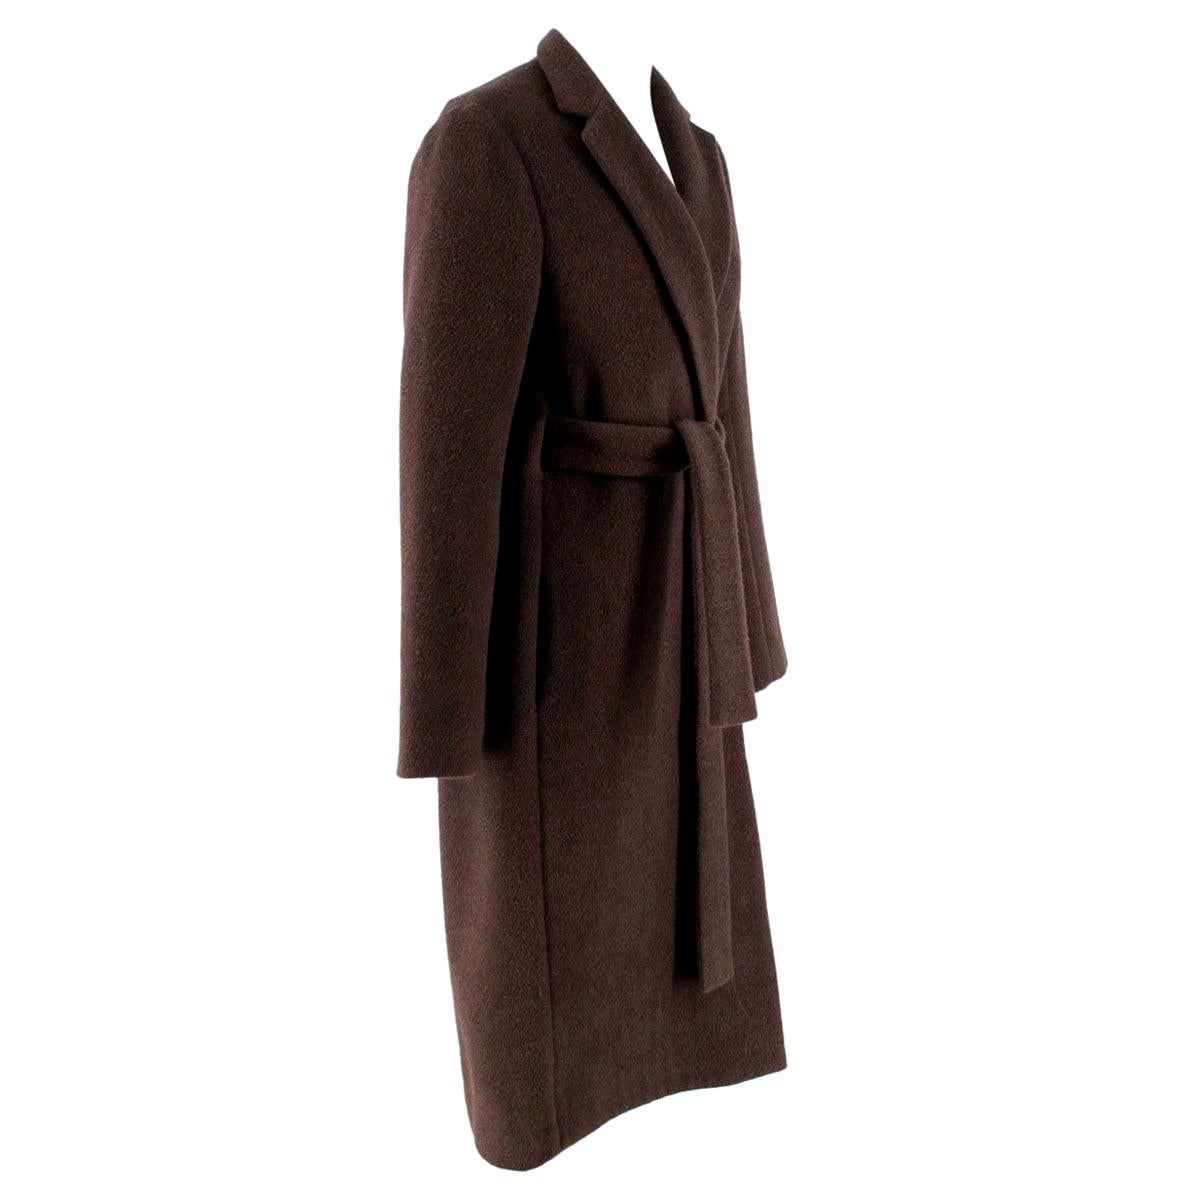 Rosetta Getty brown angora melton tailored coat - New Season - US6